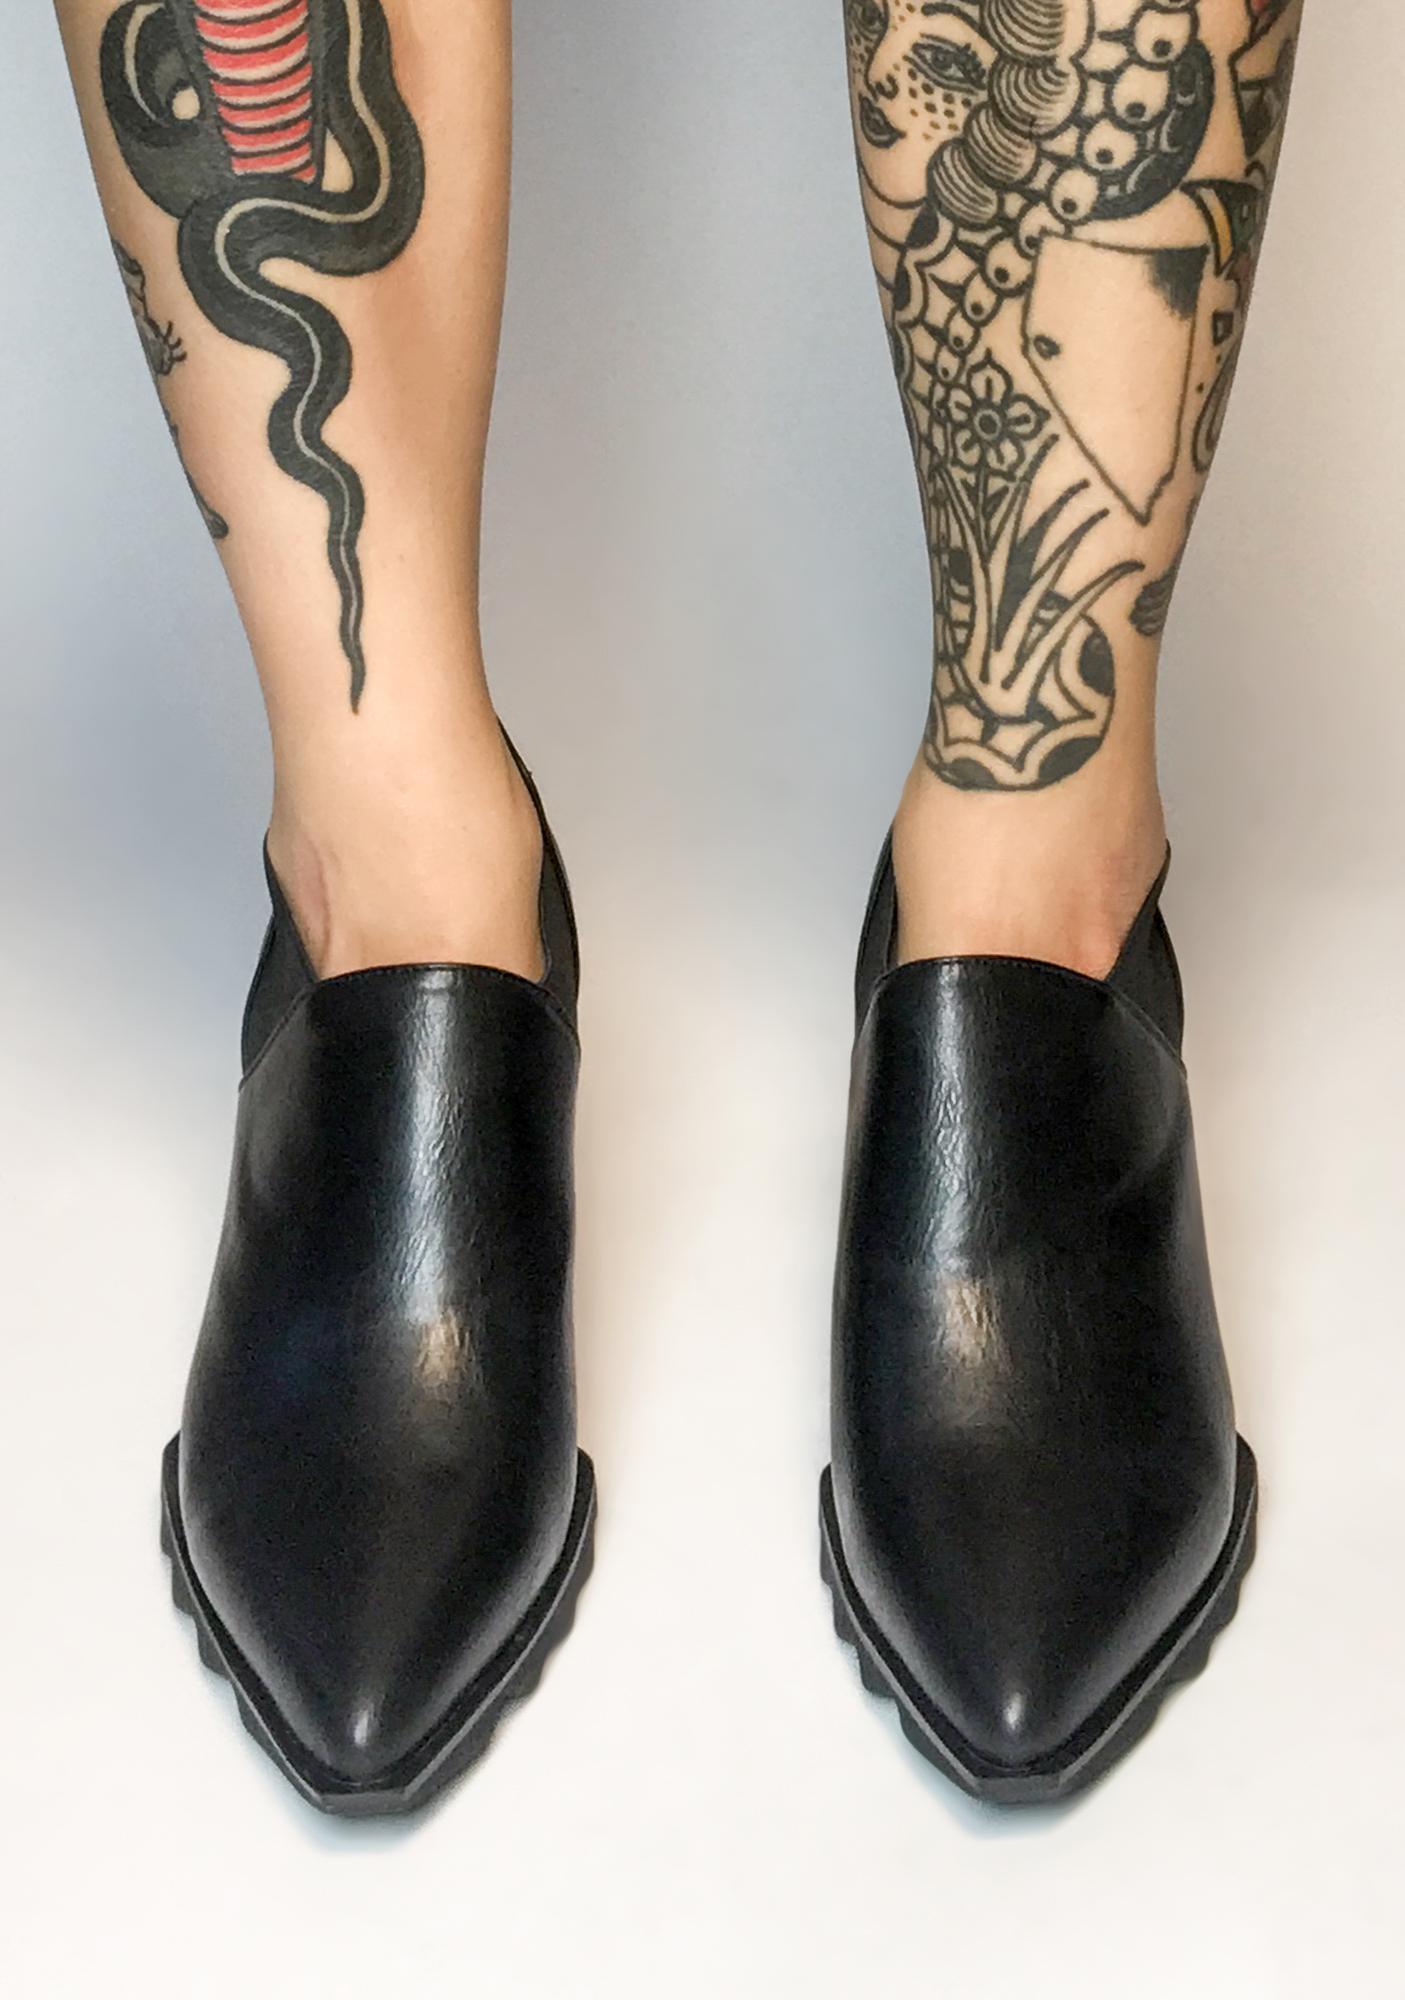 Lamoda Aspirin' Dreams Spiked Boots